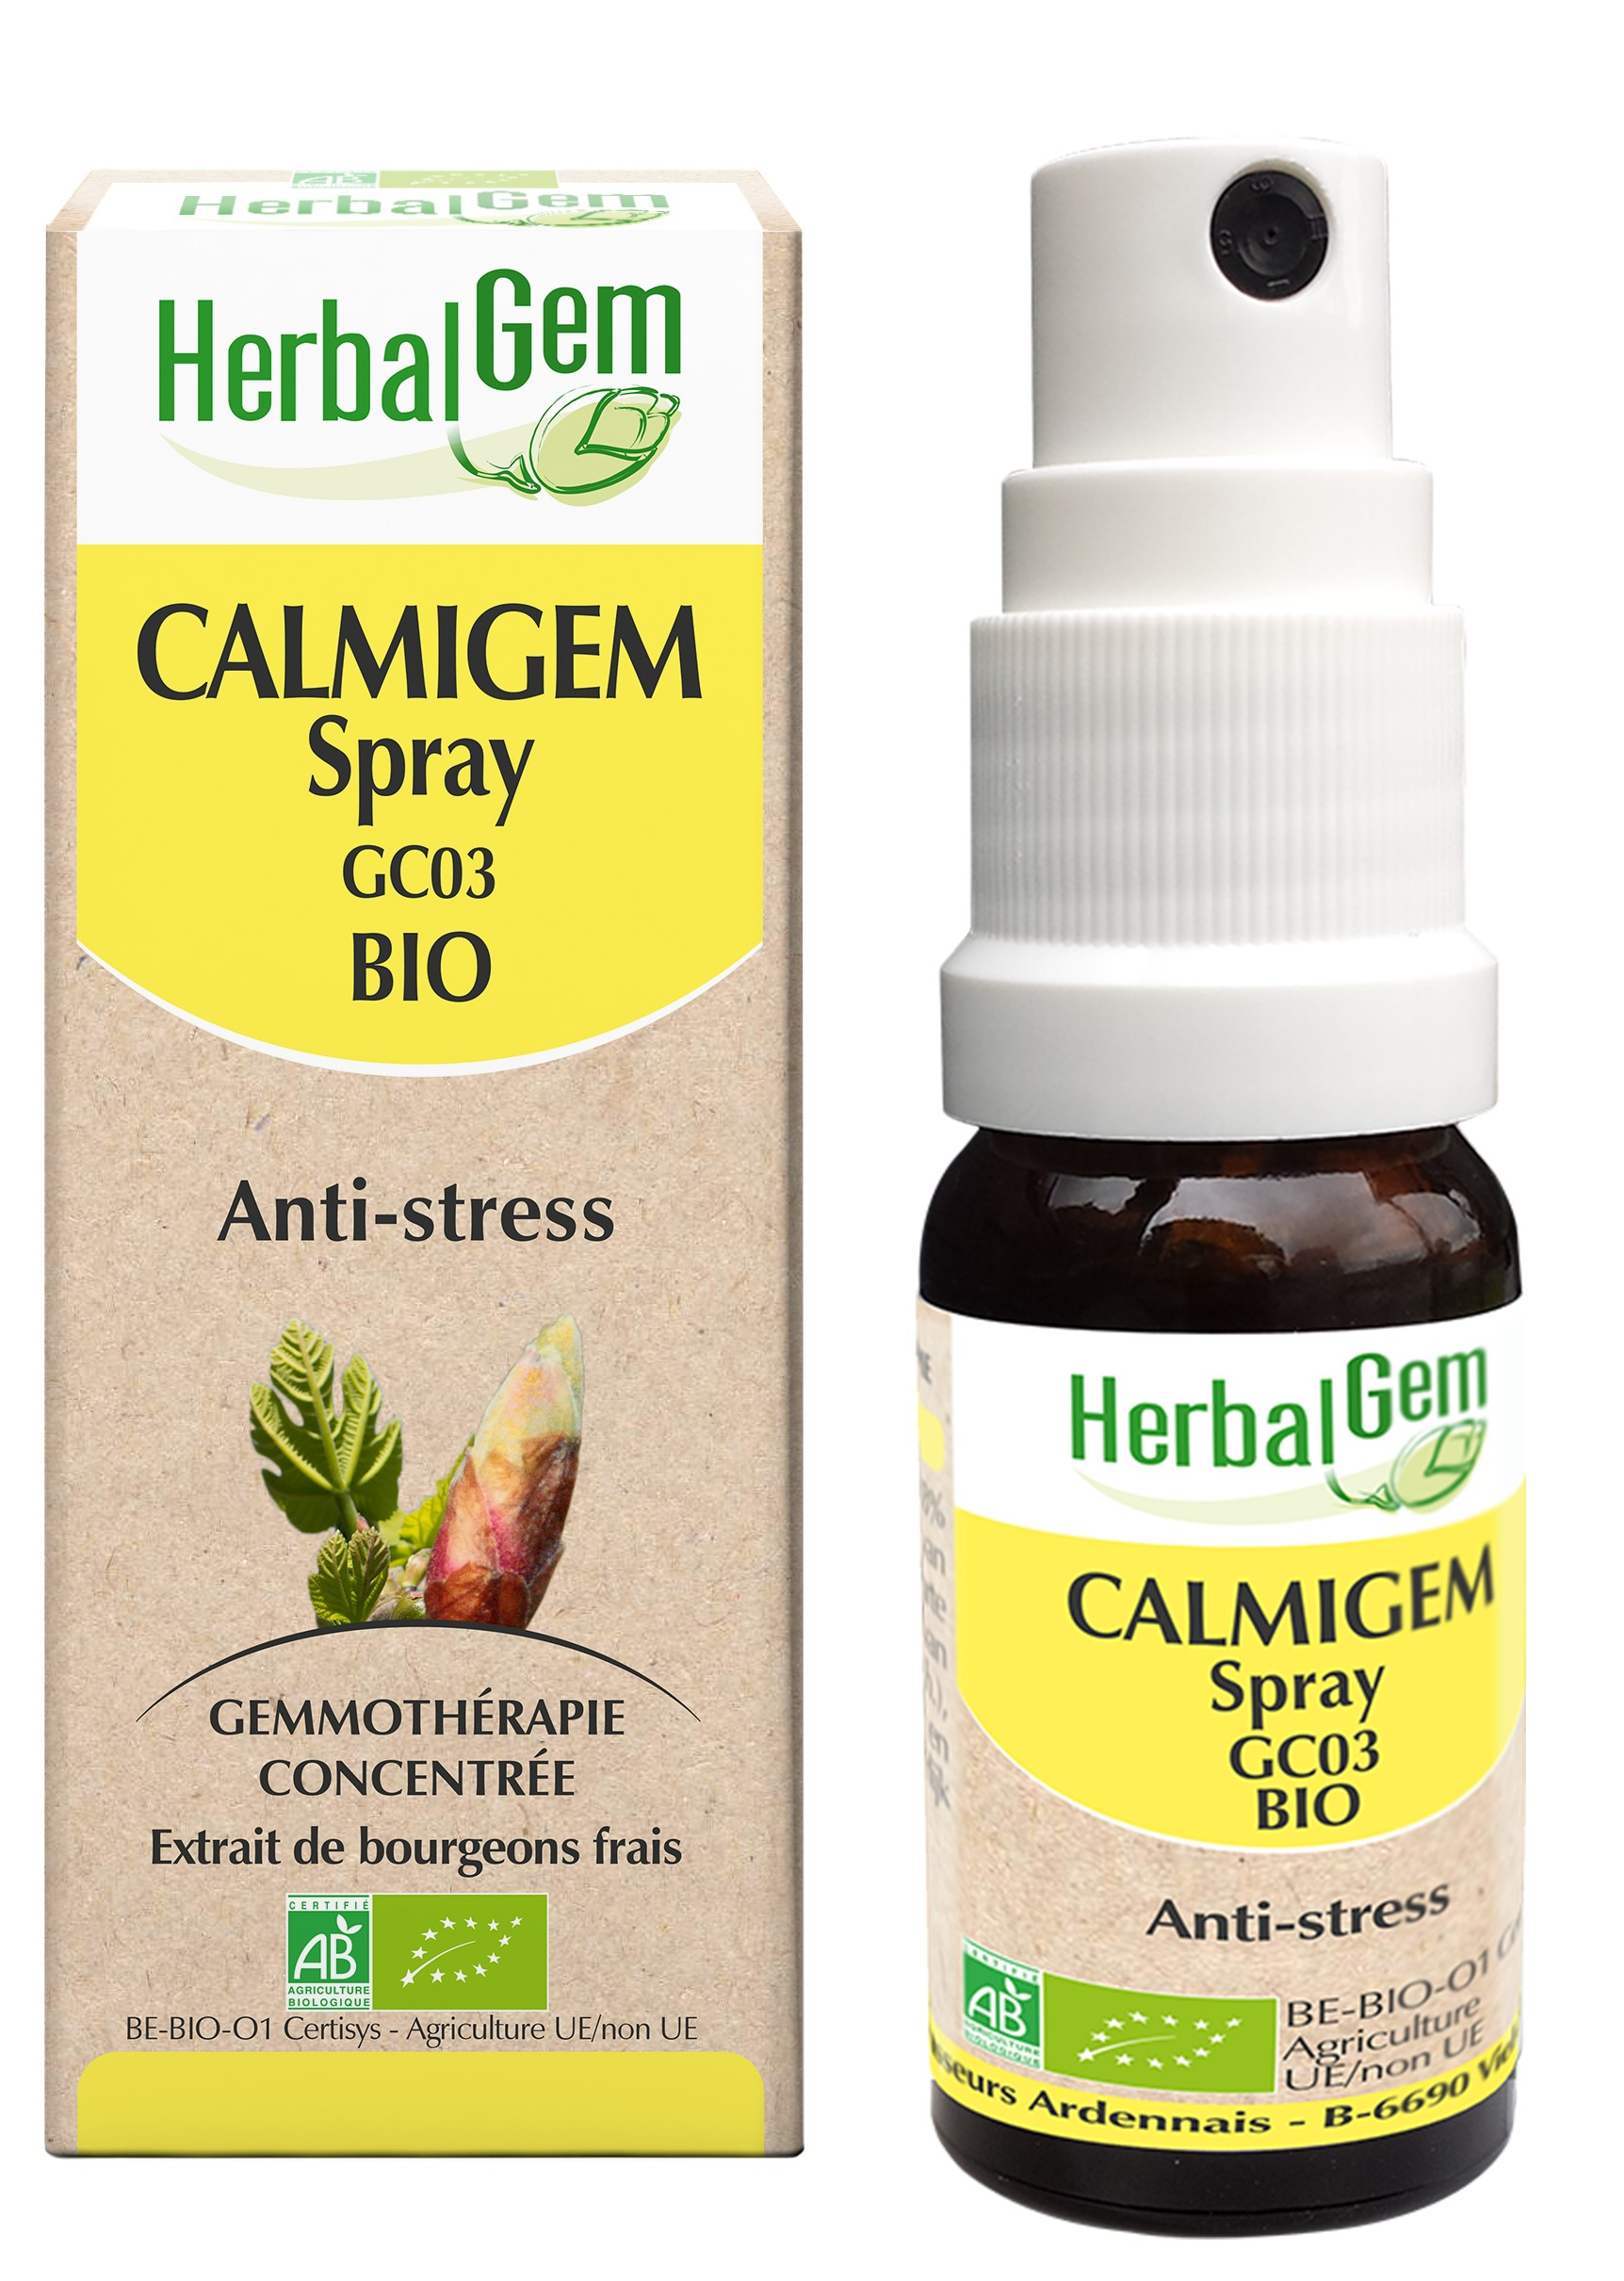 HerbalGem_calmigem